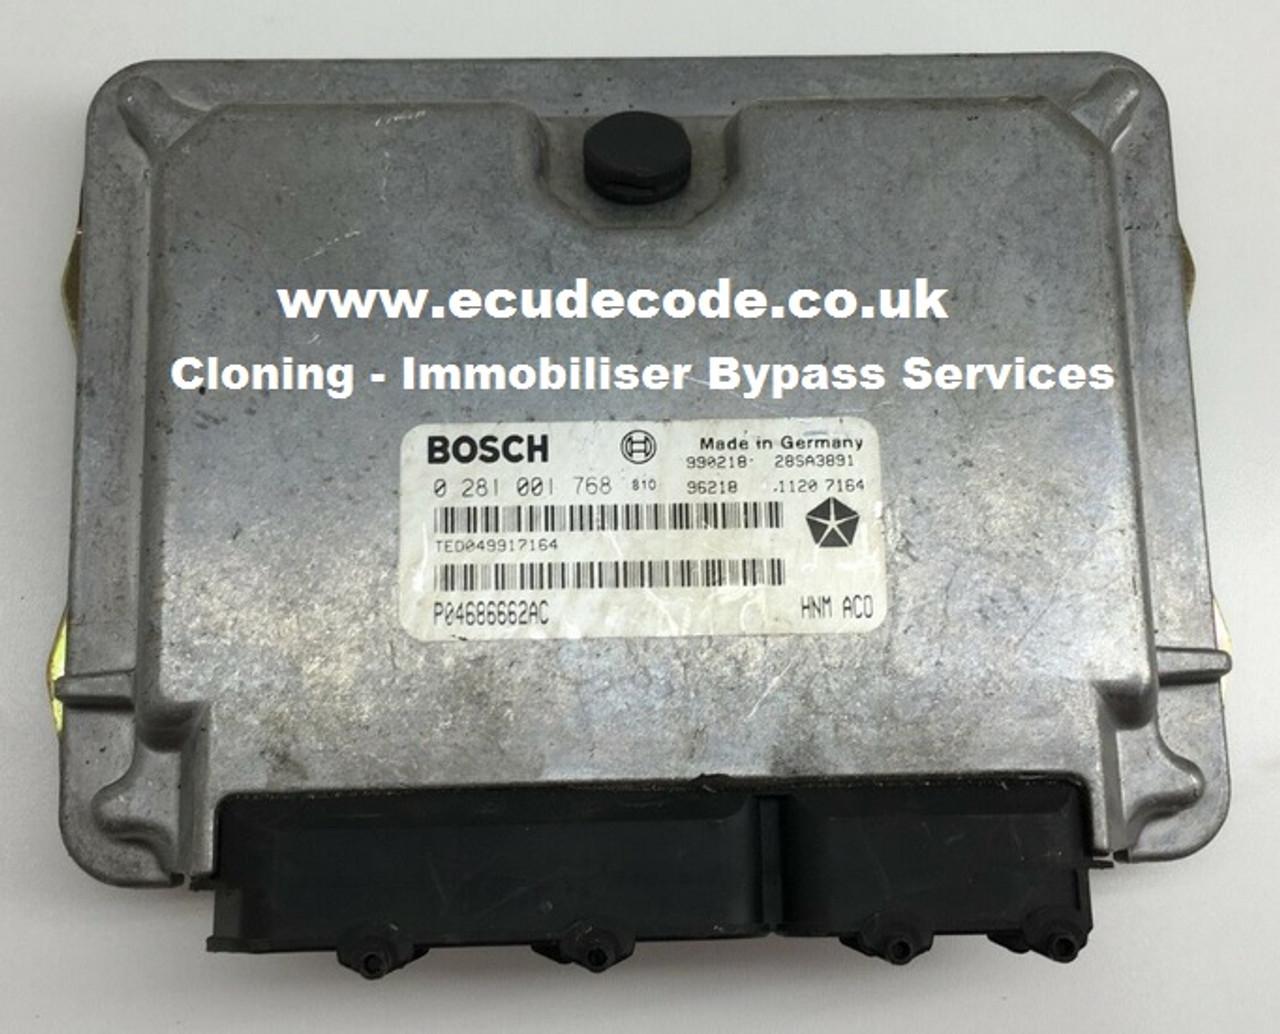 Bosch 0281001768 | Chyrsler 2 5 P04686662AC | Plug & Play UK Services